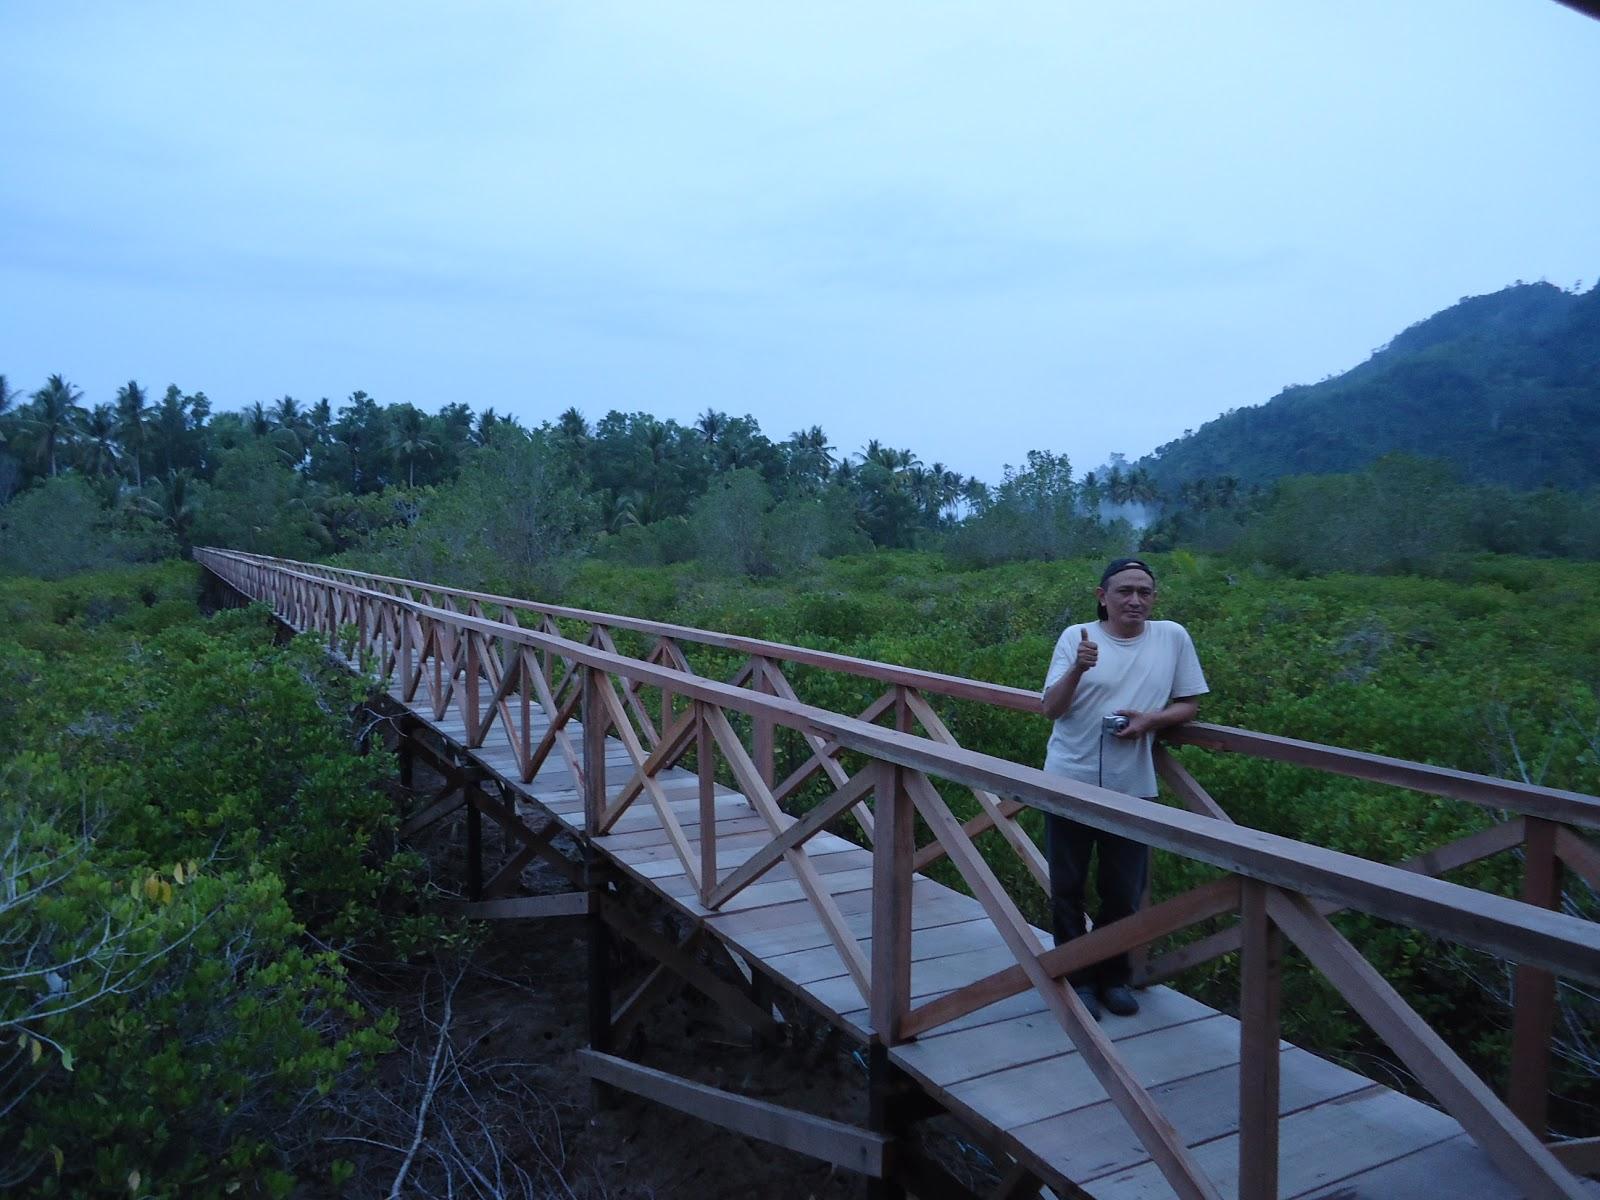 Hutan Mangrove Pancer Cengkrong Cantik Jembatan Atas Pengunjung Kab Trenggalek